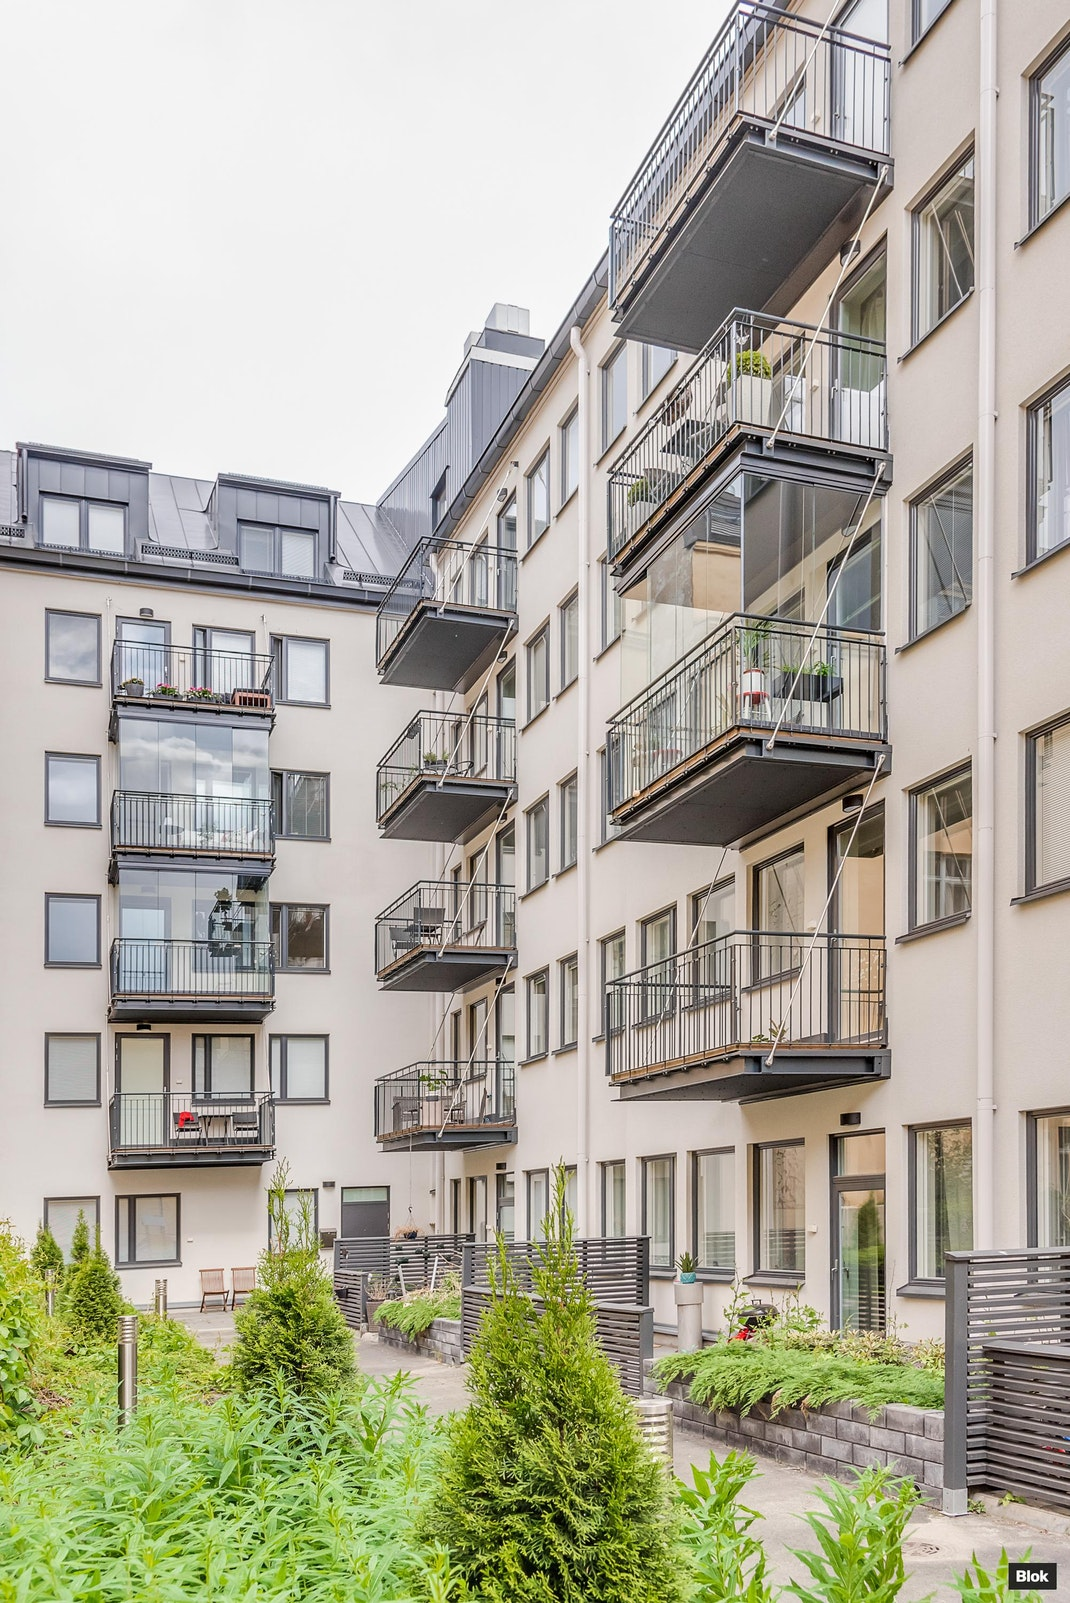 Blok ― Hietalahdenkatu 8 A 10, 00180 Helsinki